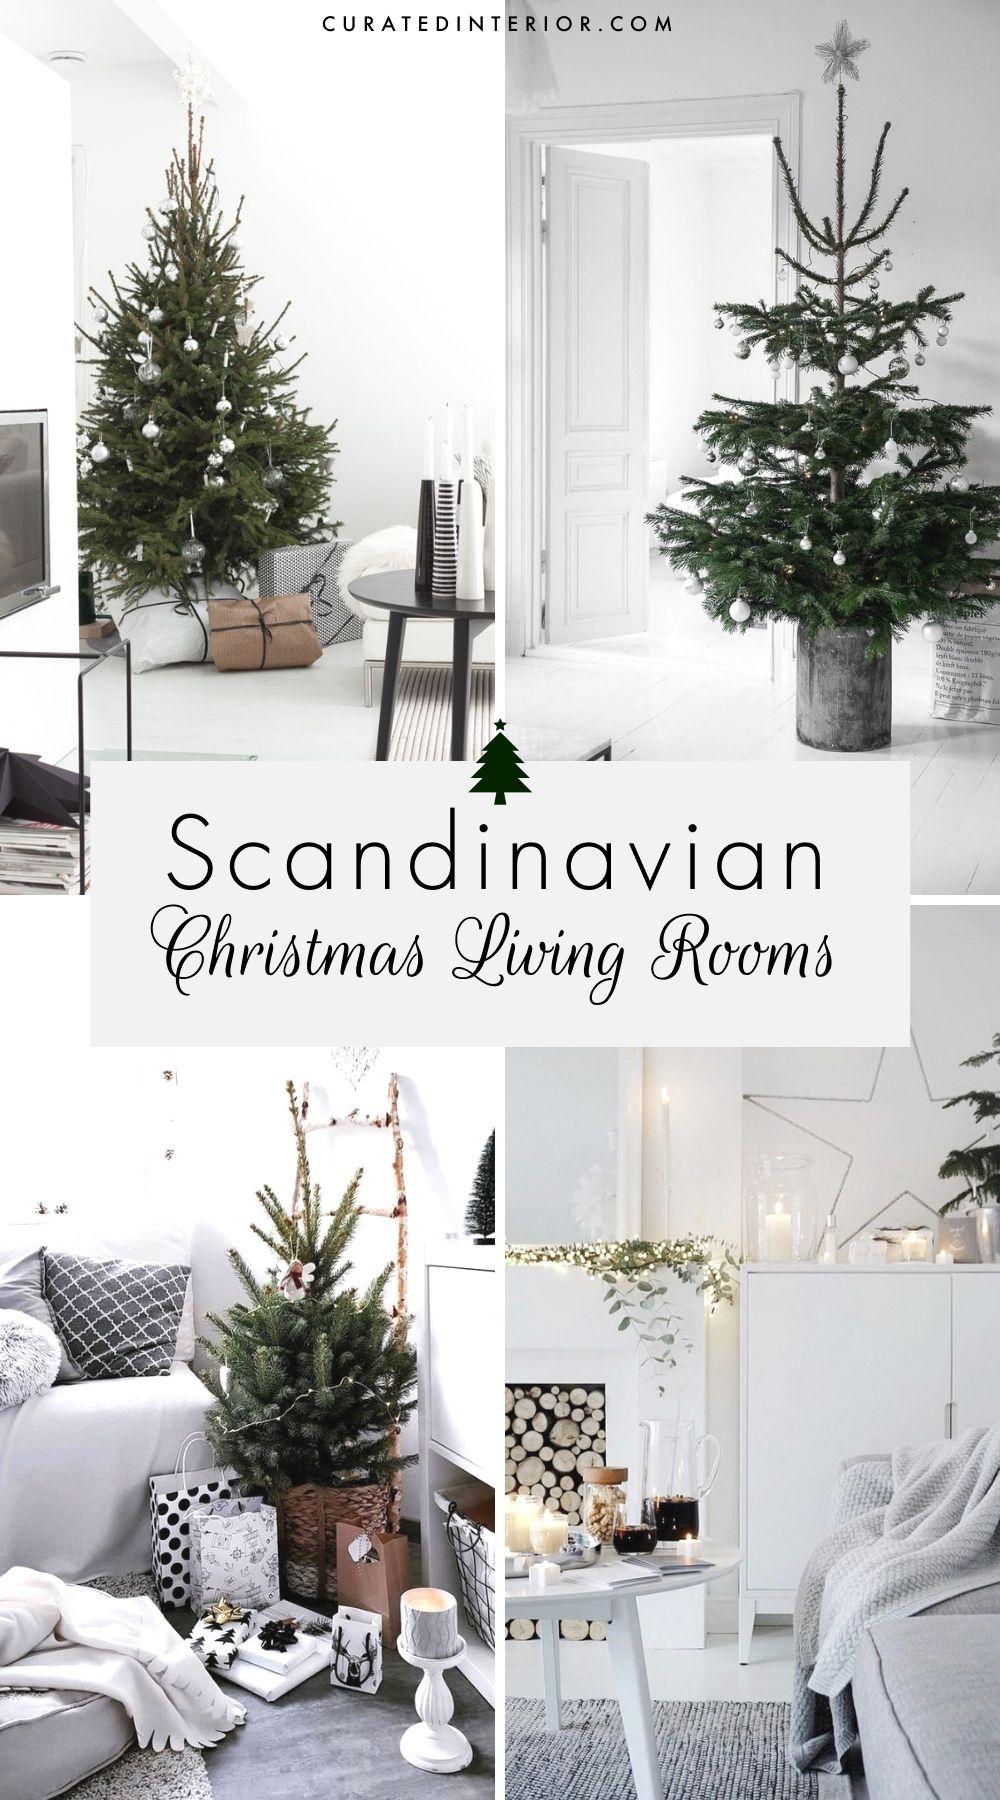 Scandinavian Christmas Living Rooms